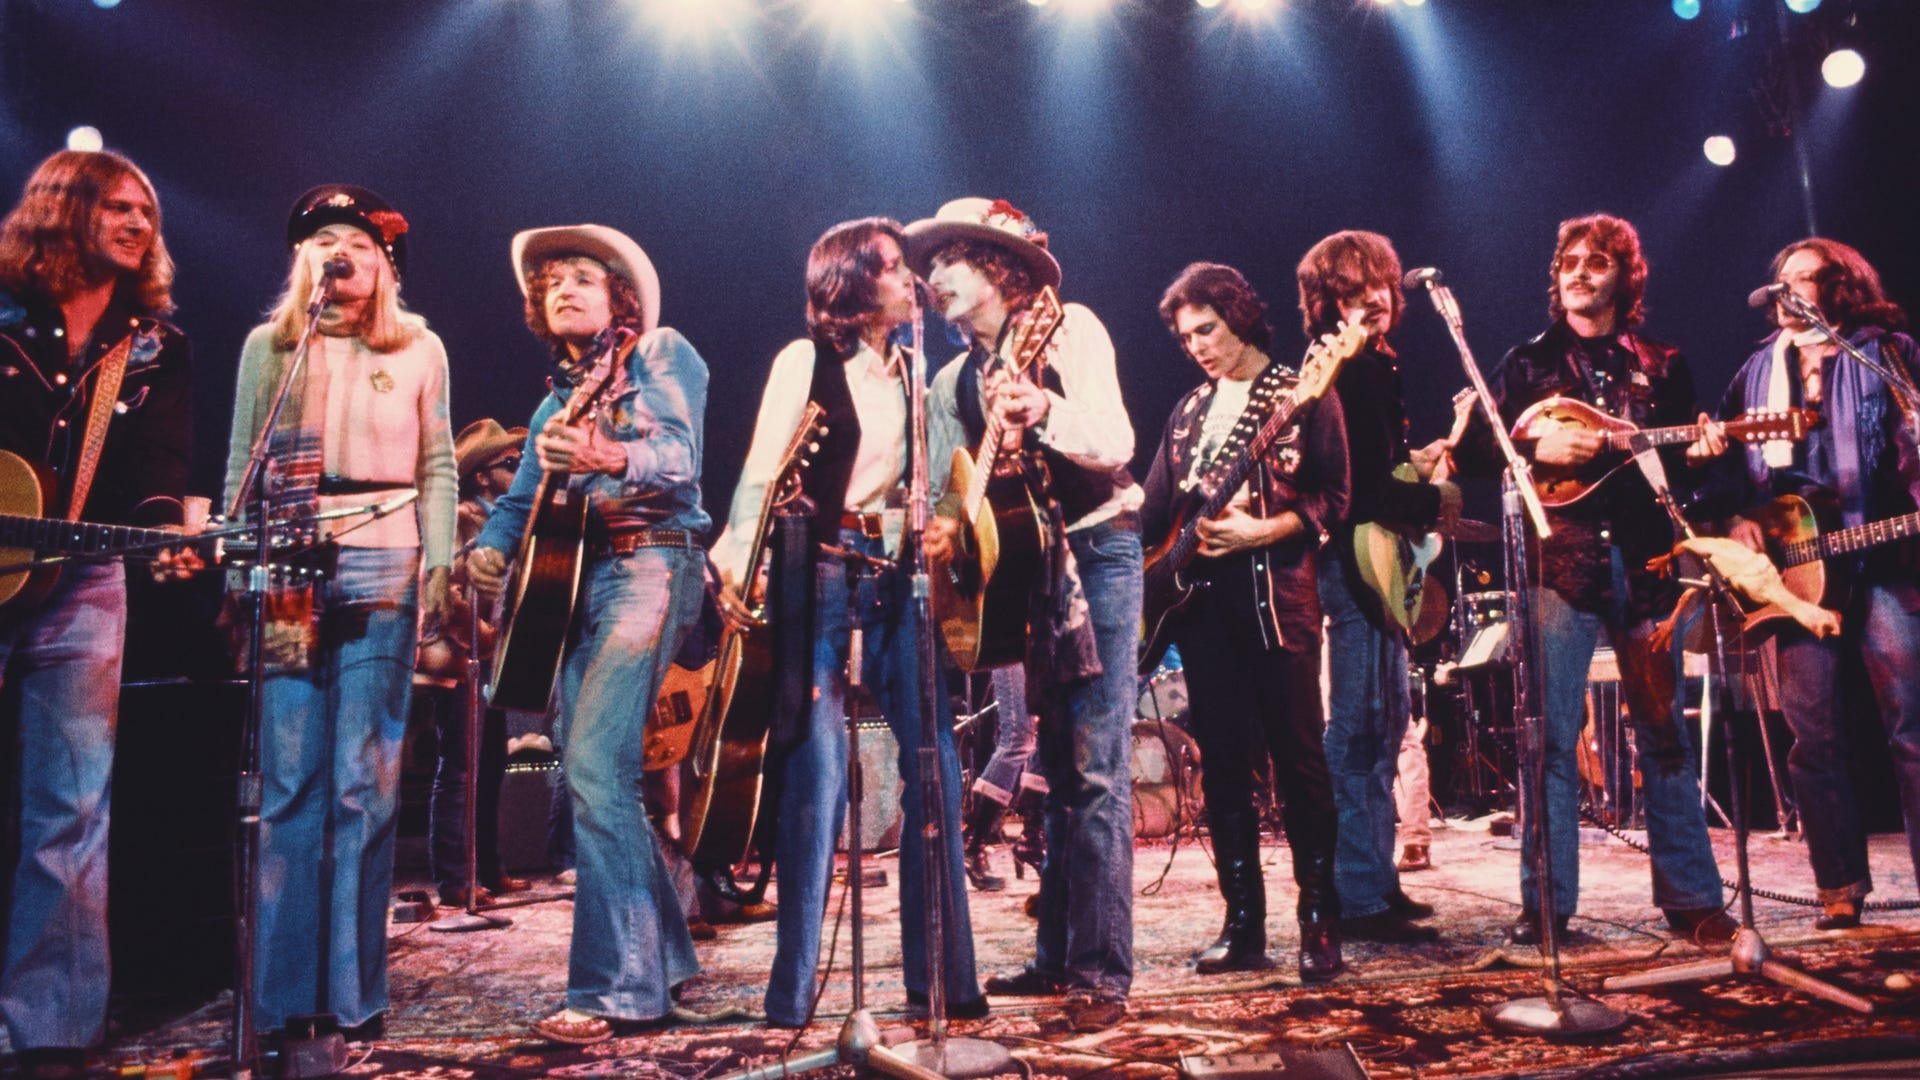 Bob Dylan, Rolling Thunder Revue: A Bob Dylan Story by Martin Scorsese